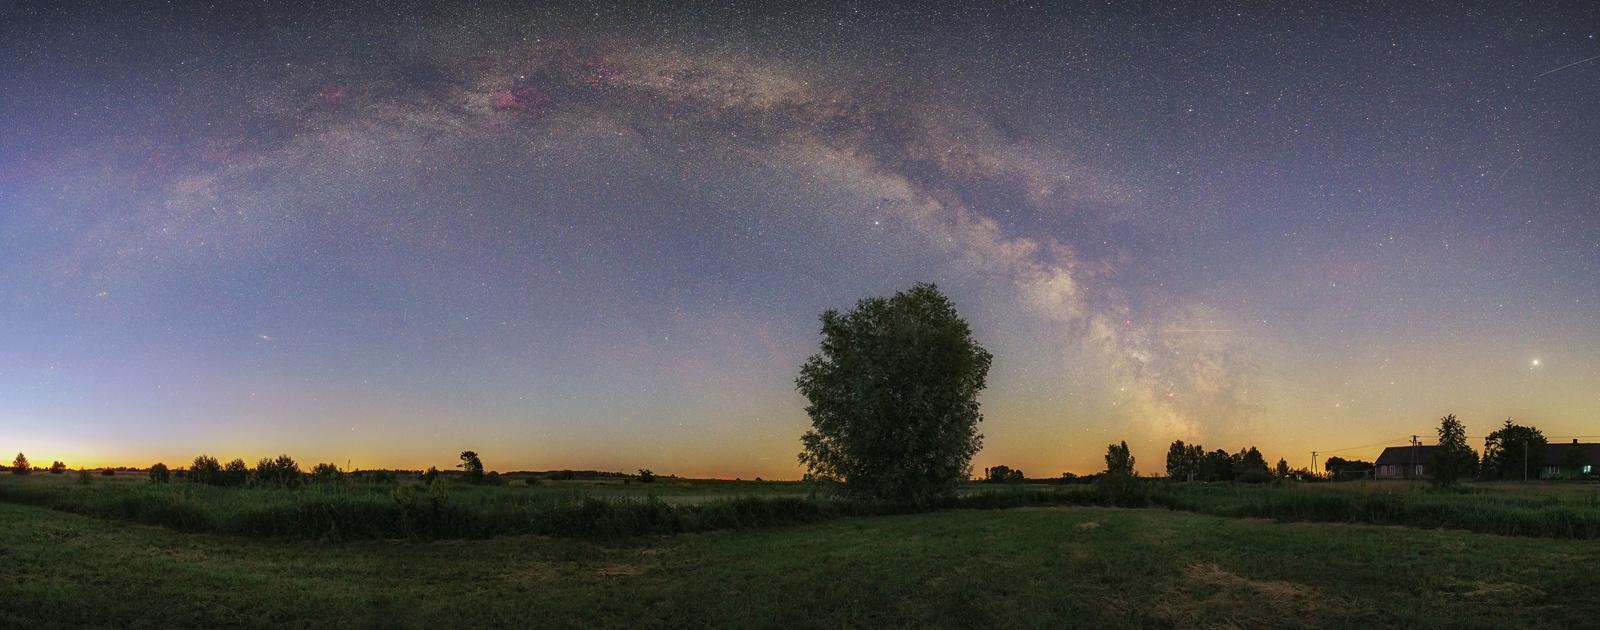 Kiełpiniec_Panorama_09_06_2018_finał.jpg